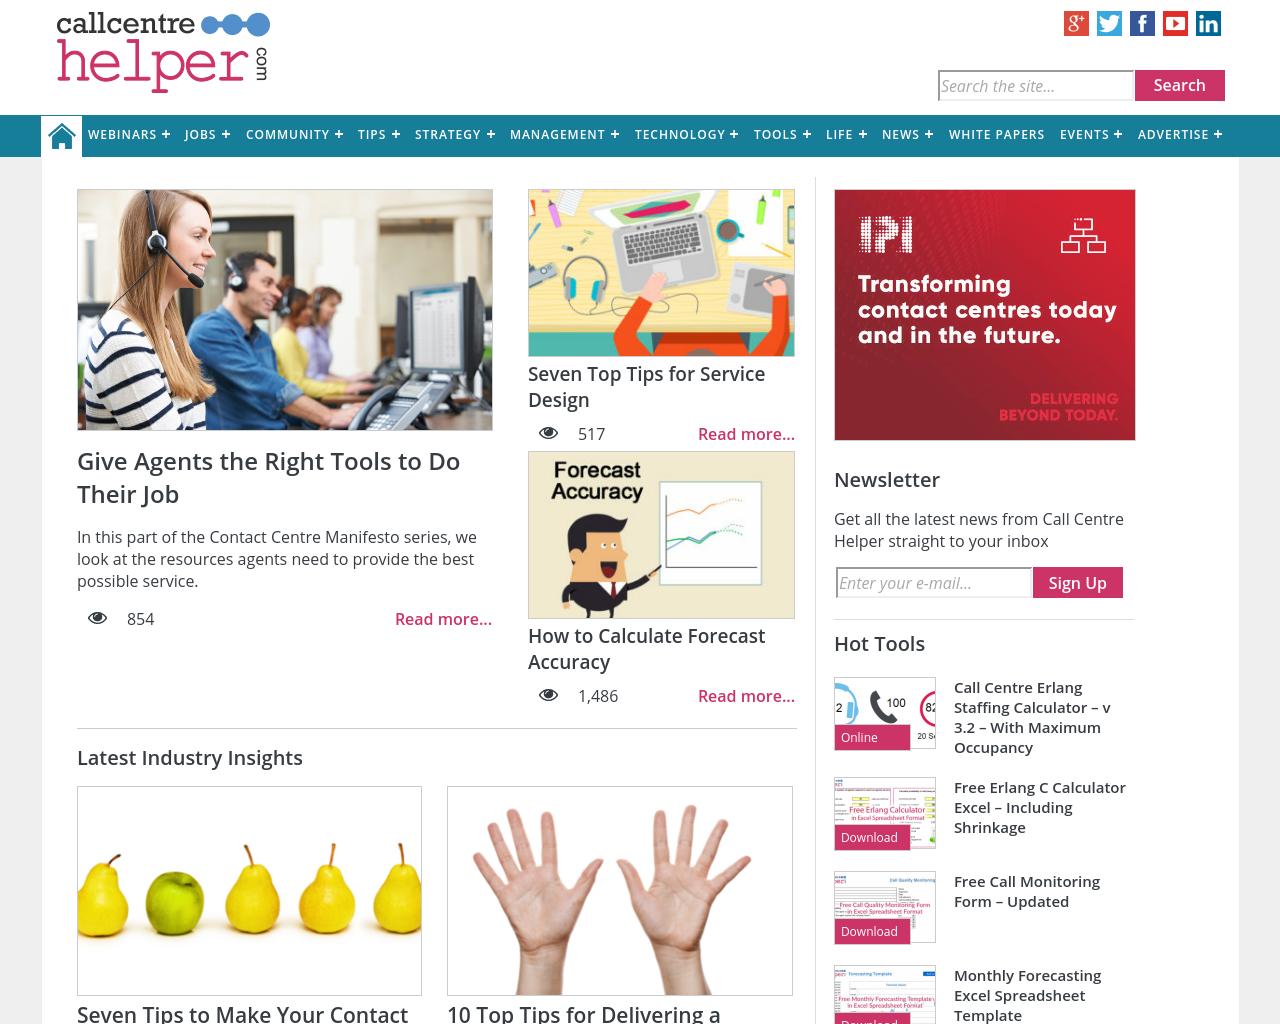 Call-Centre-Helper-Magazine-Advertising-Reviews-Pricing